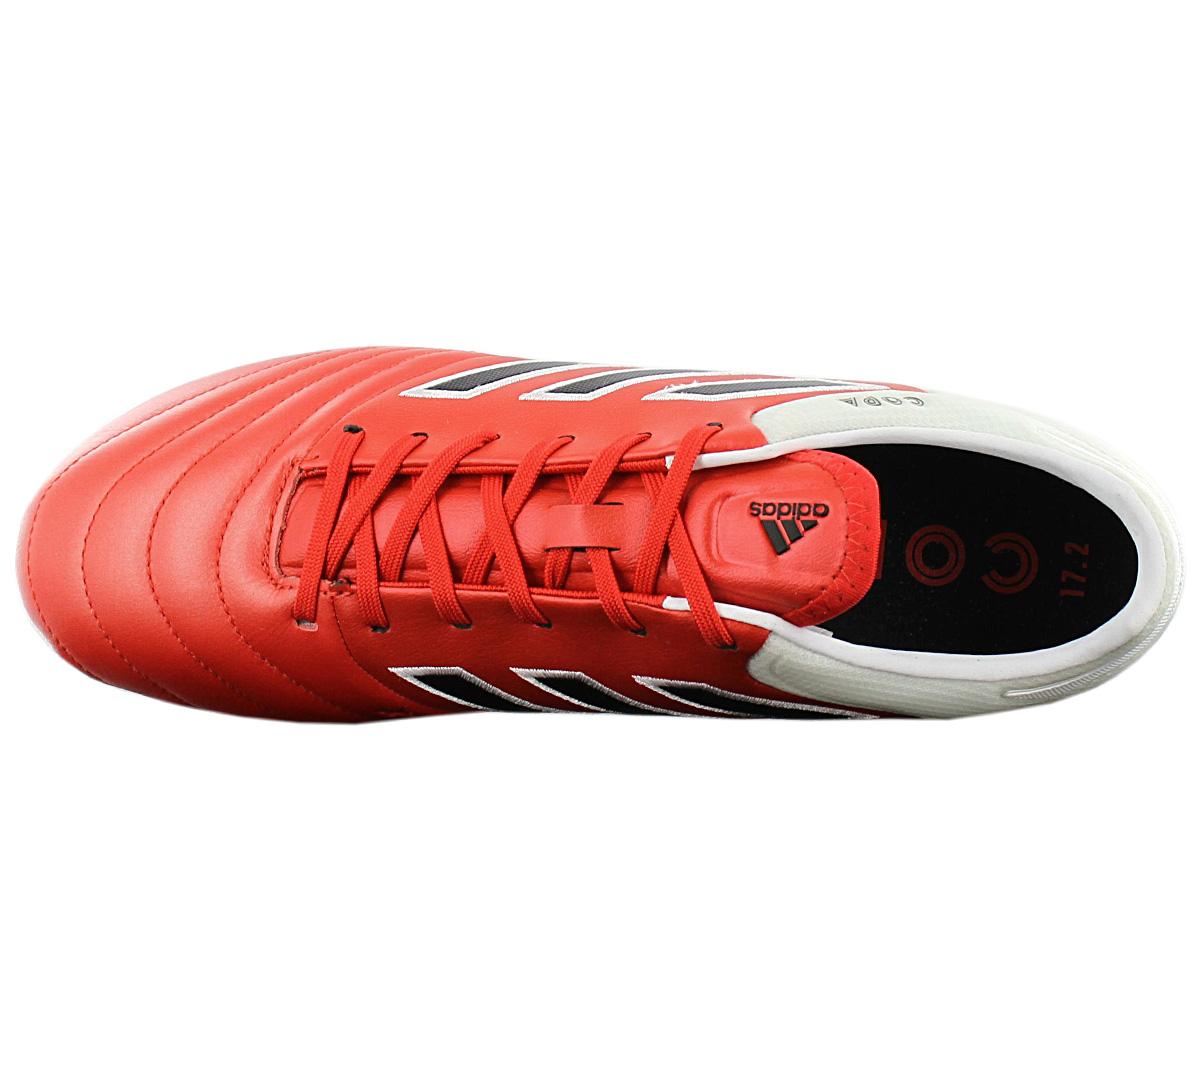 cheaper 83f3b 1d090 Adidas Copa 17.2 Fg Mens Cam Shoes Leather Red BB3553 Mundia